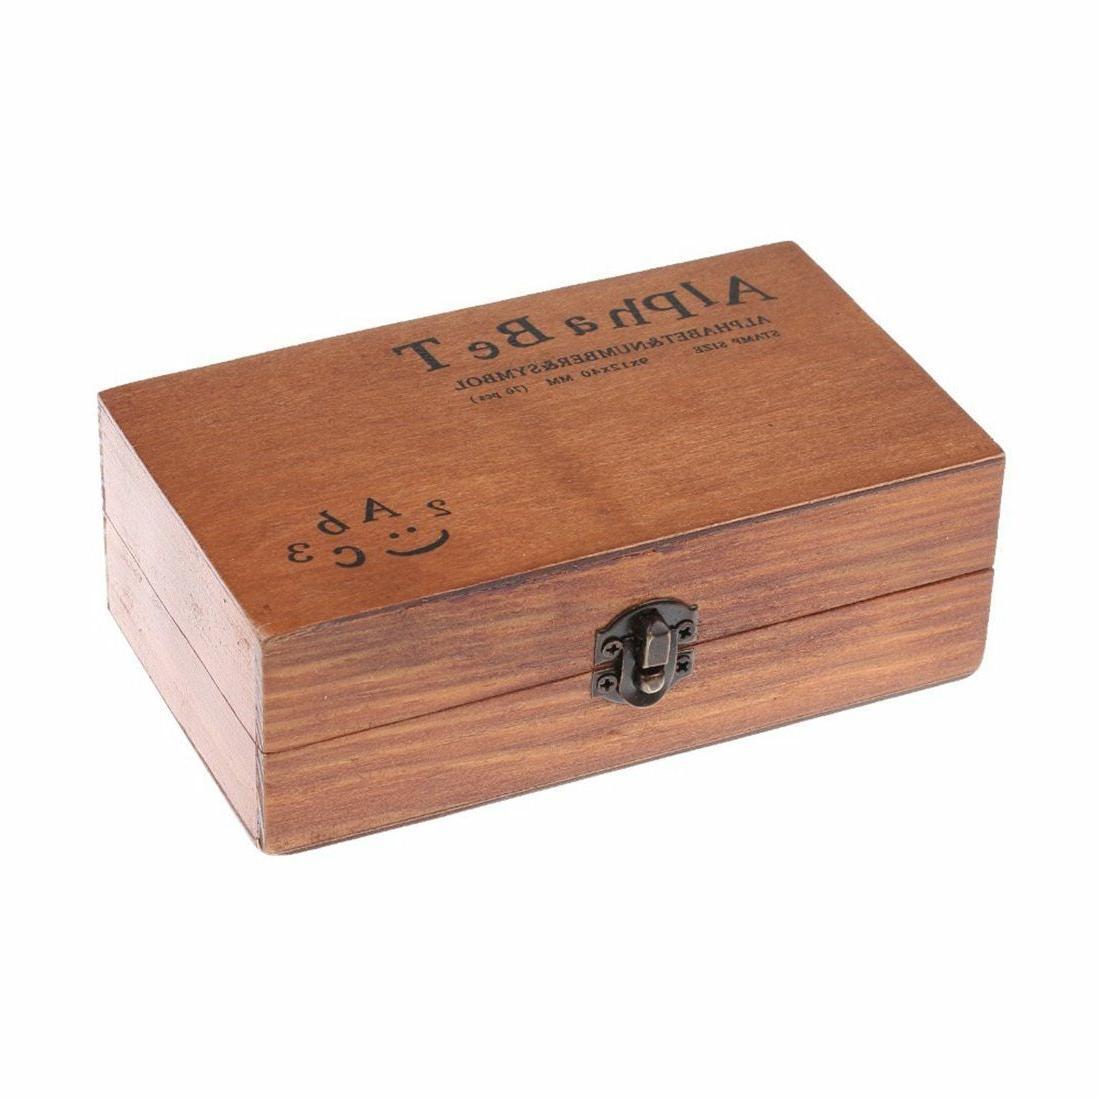 70pcs Vintage DIY And Alphabet Letter Wood Rubber Stamps Box NEW